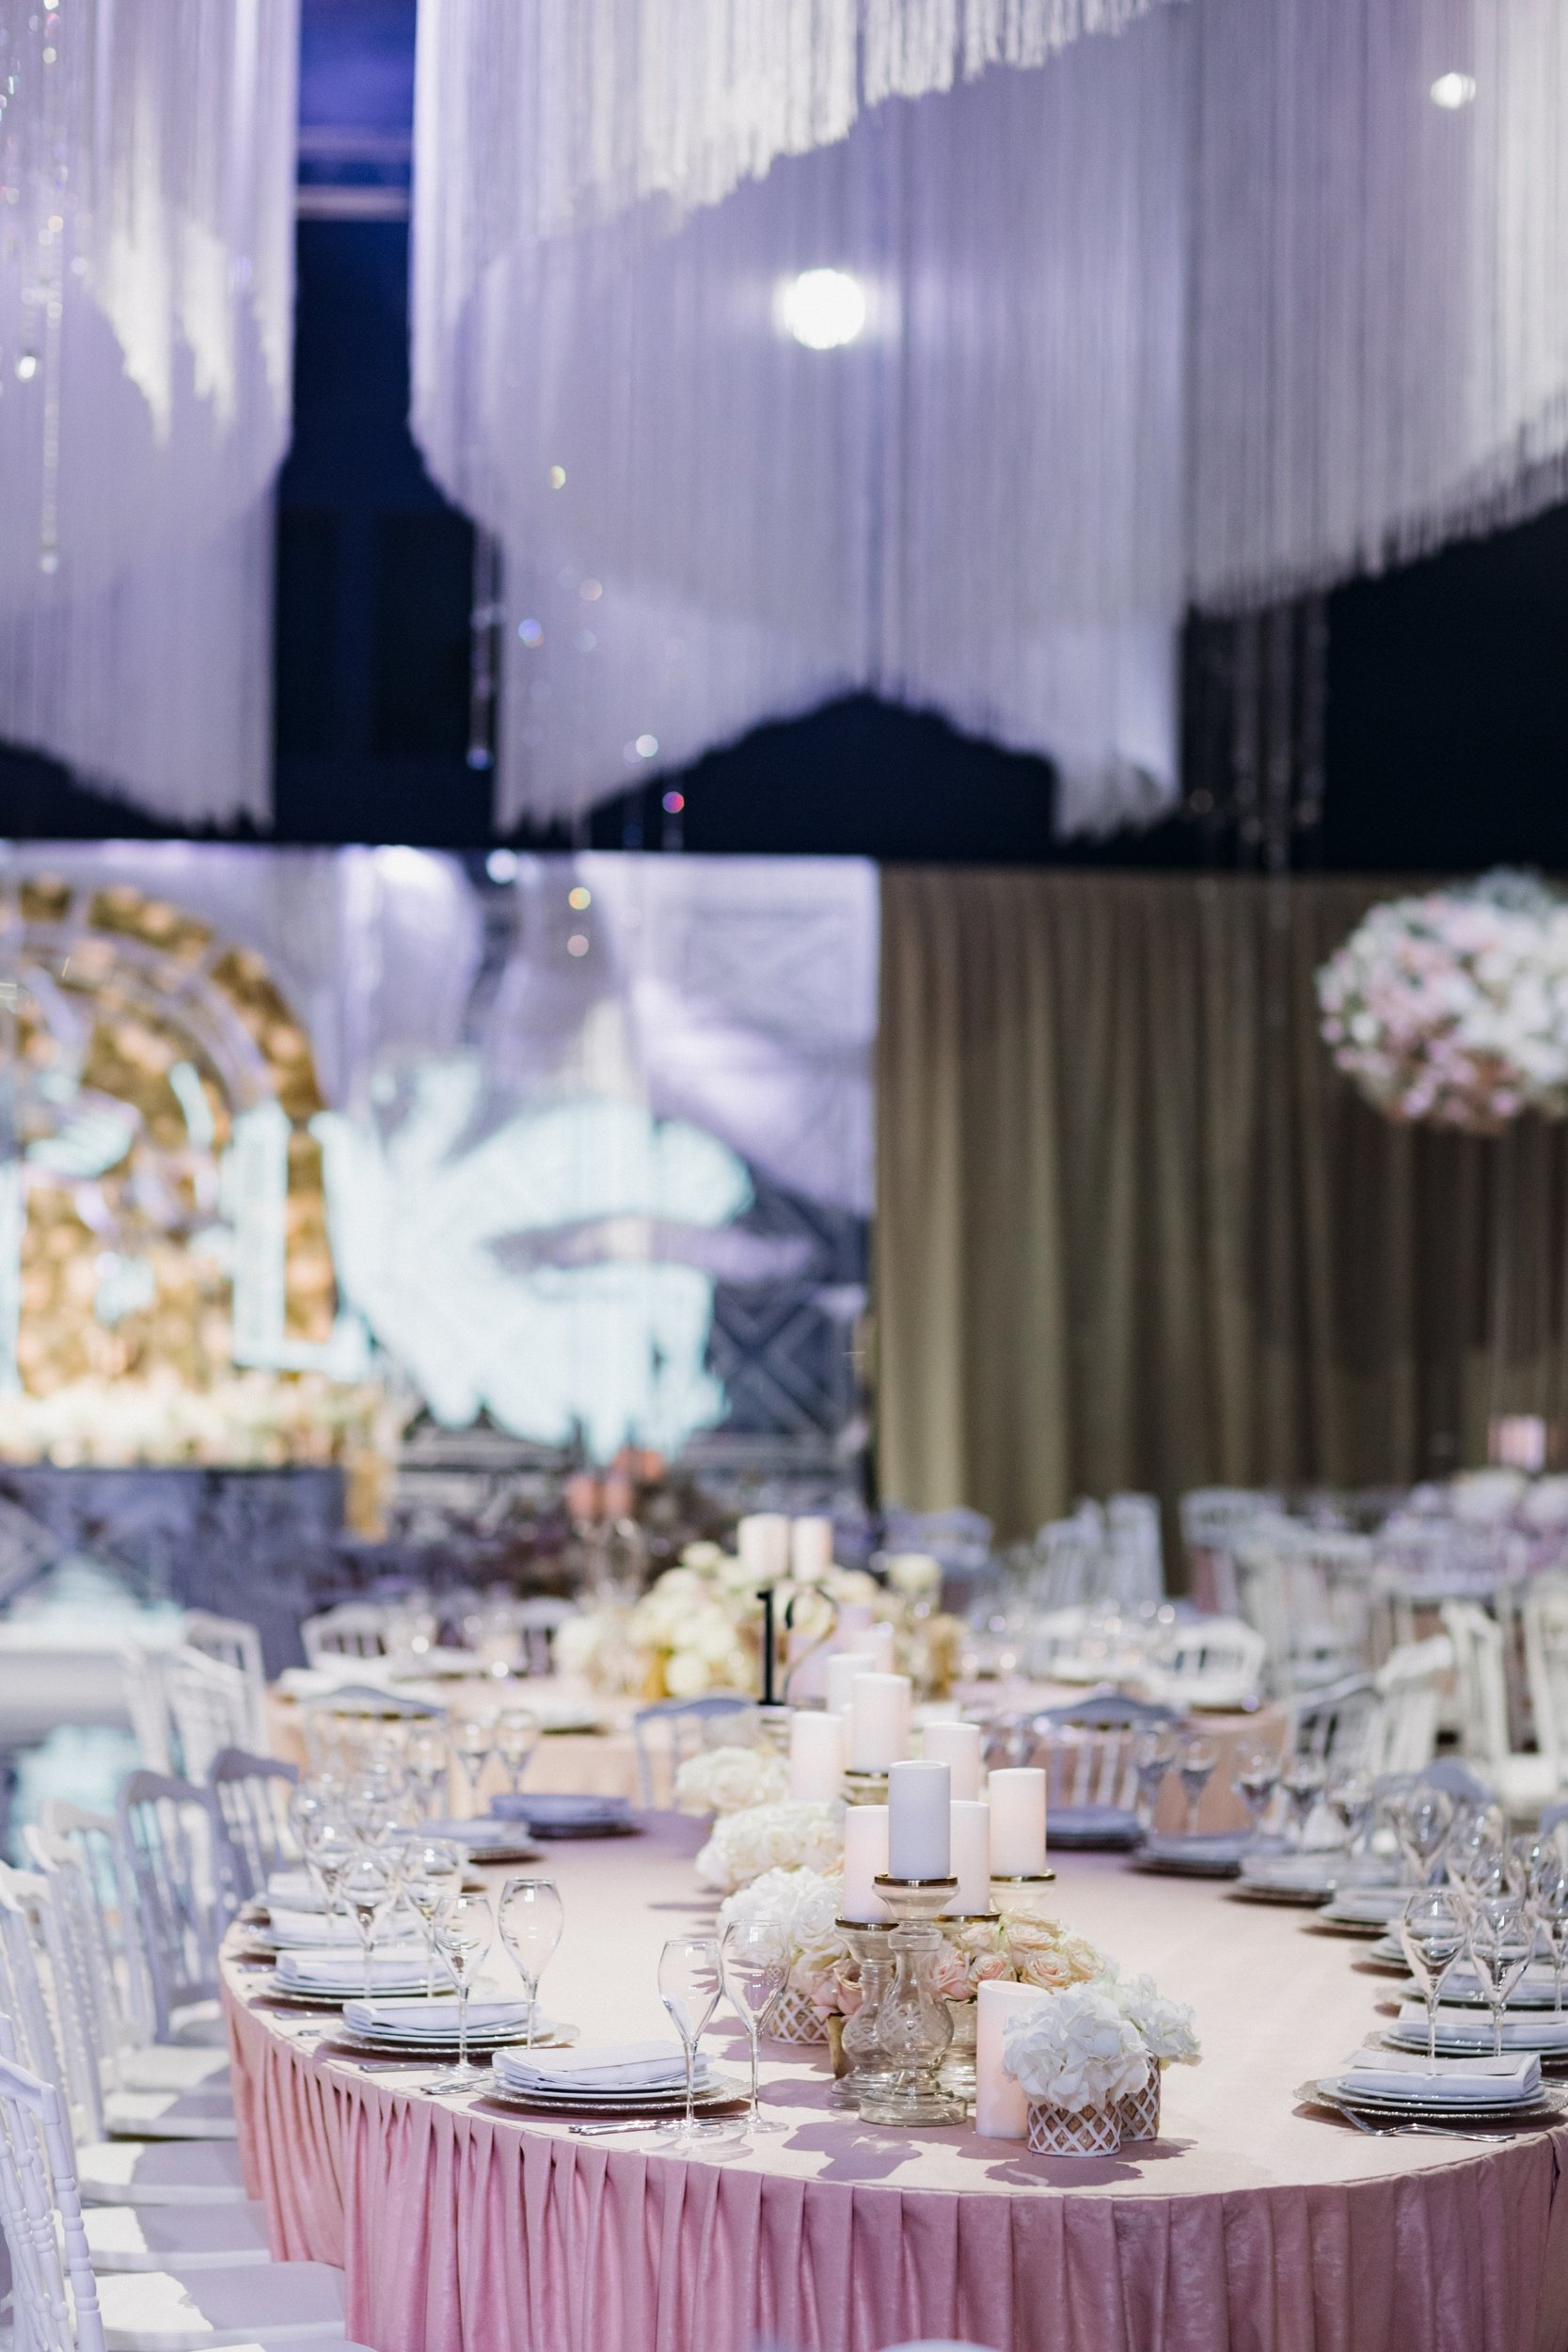 © Andrew Bayda Wedding Photography / Misha Moon Wedding Photography / JR Wedding Planner / Lidiya Simonova Decorator